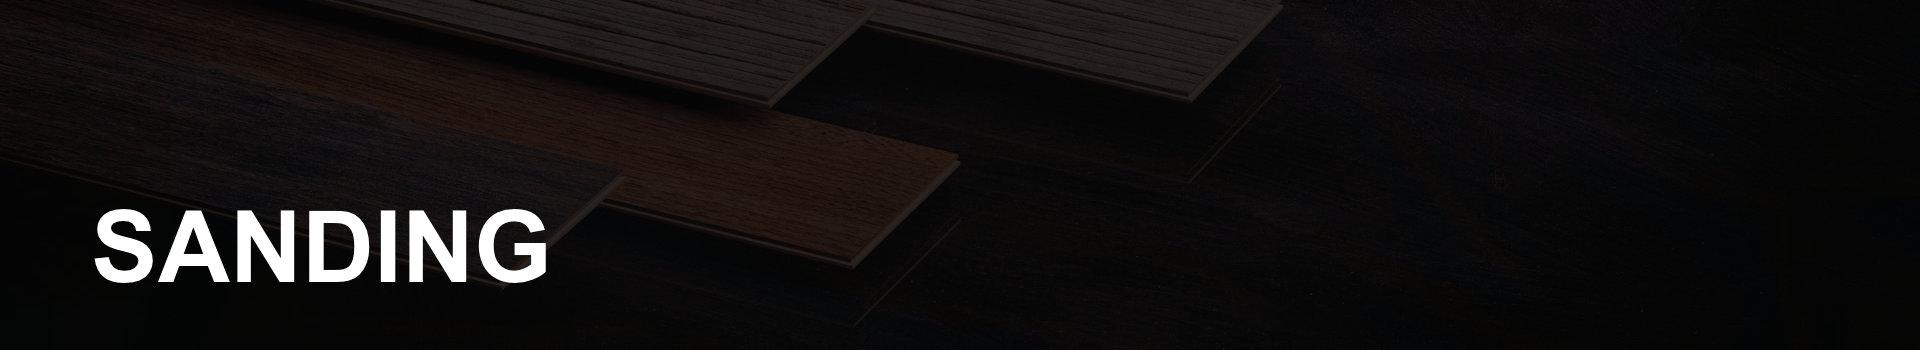 sanding hardwood flooring